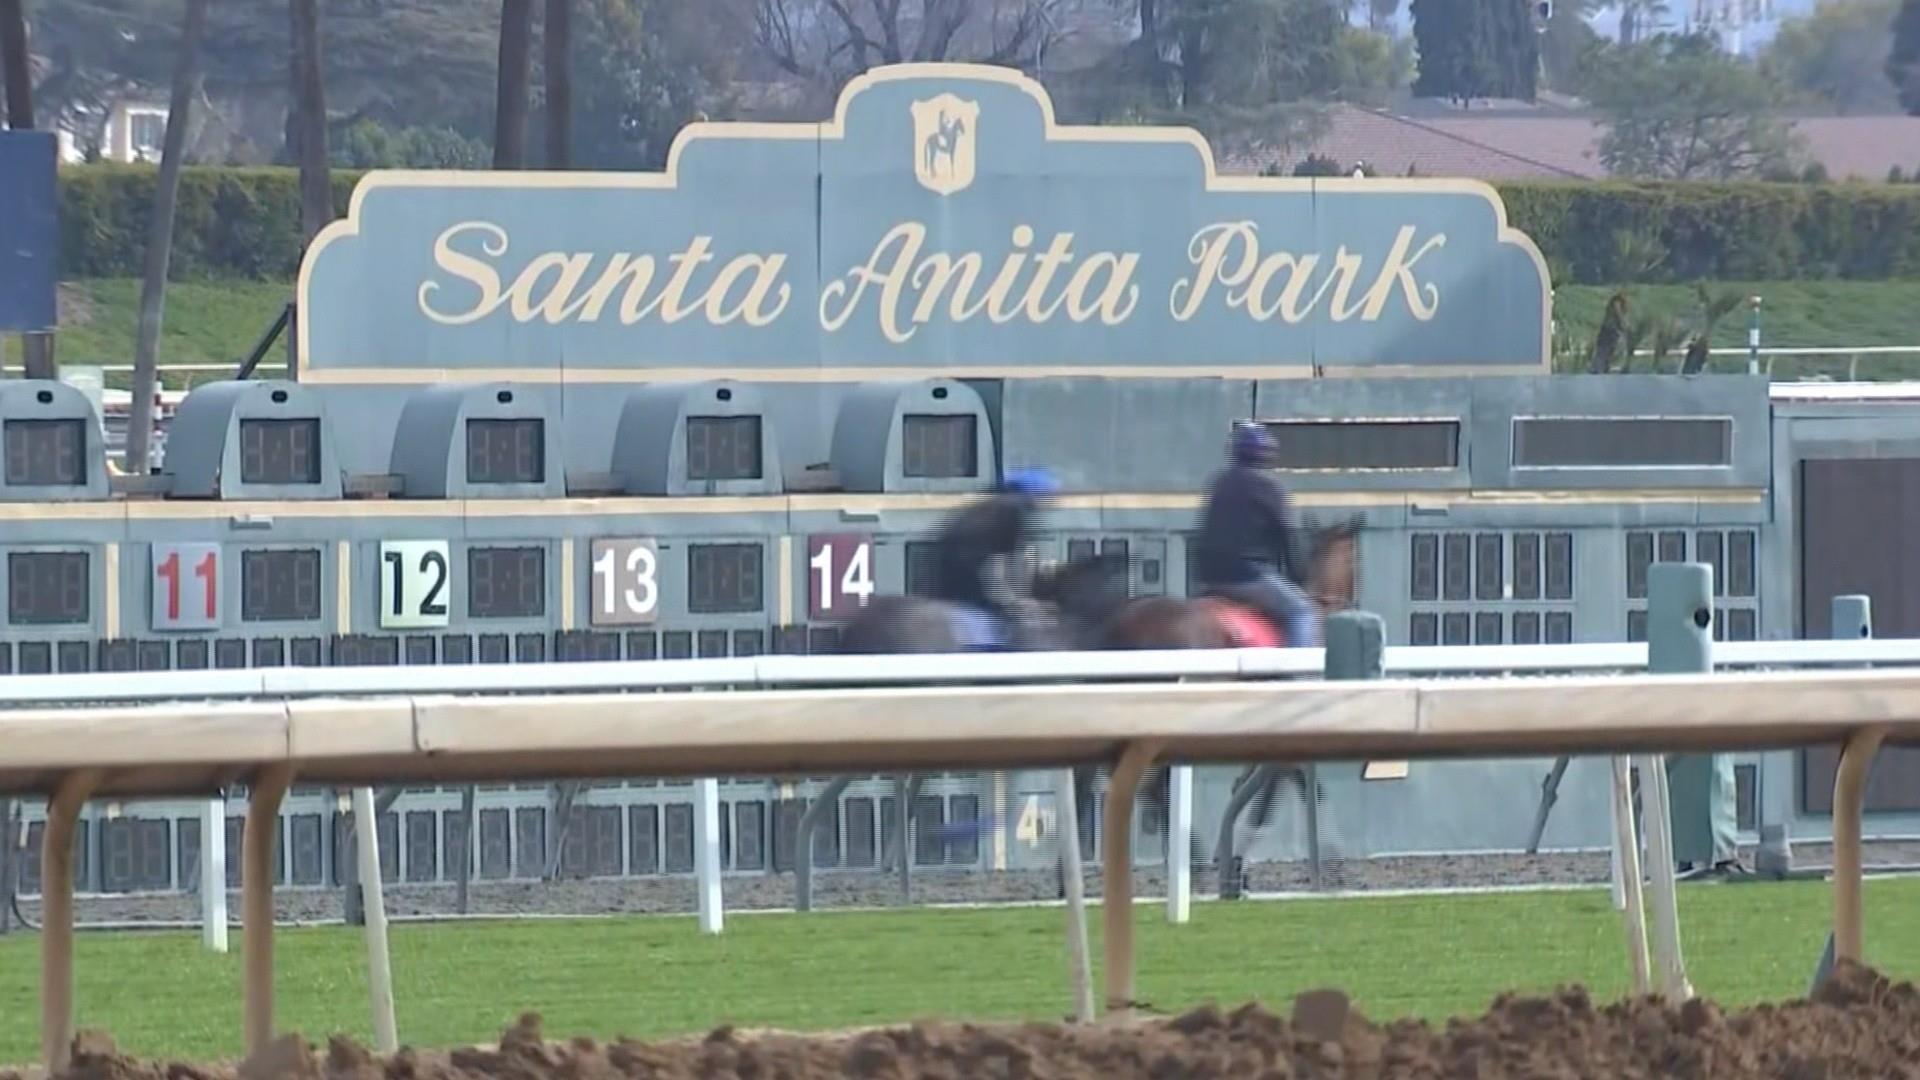 23rd horse dies at Santa Anita racetrack, two days after racing resumed